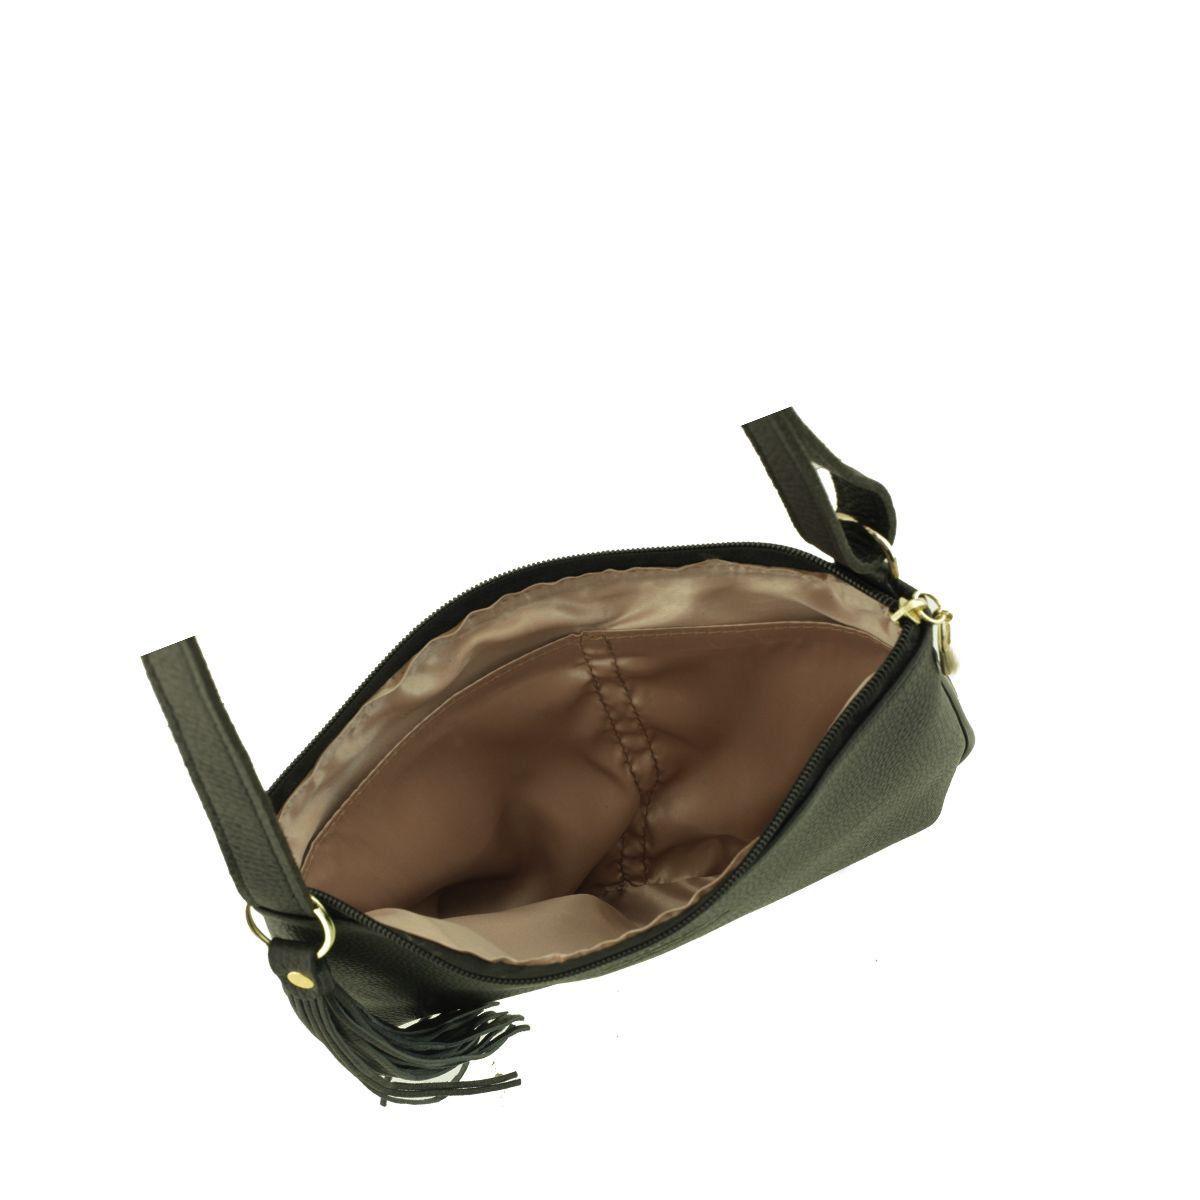 Bolsa Transversal Pequena Preto Fosco